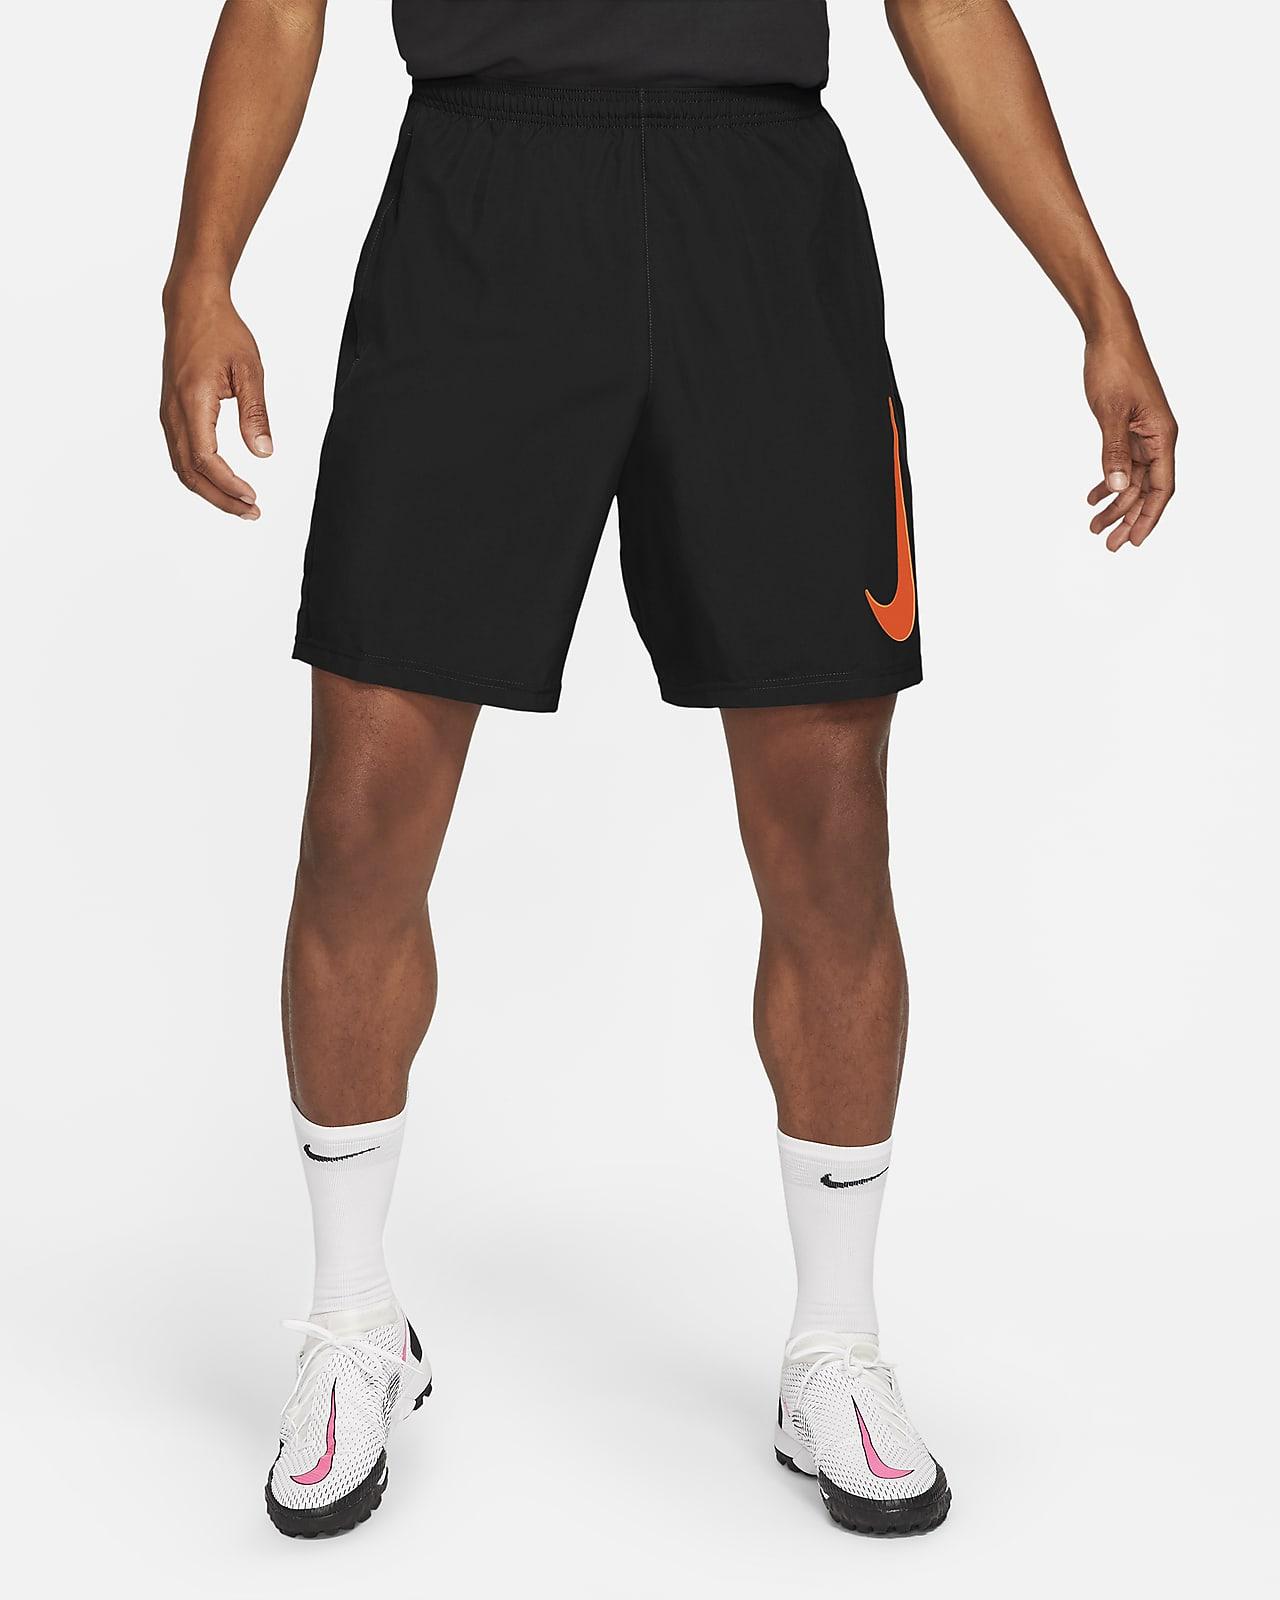 Nike Dri-FIT Academy Men's Woven Football Shorts